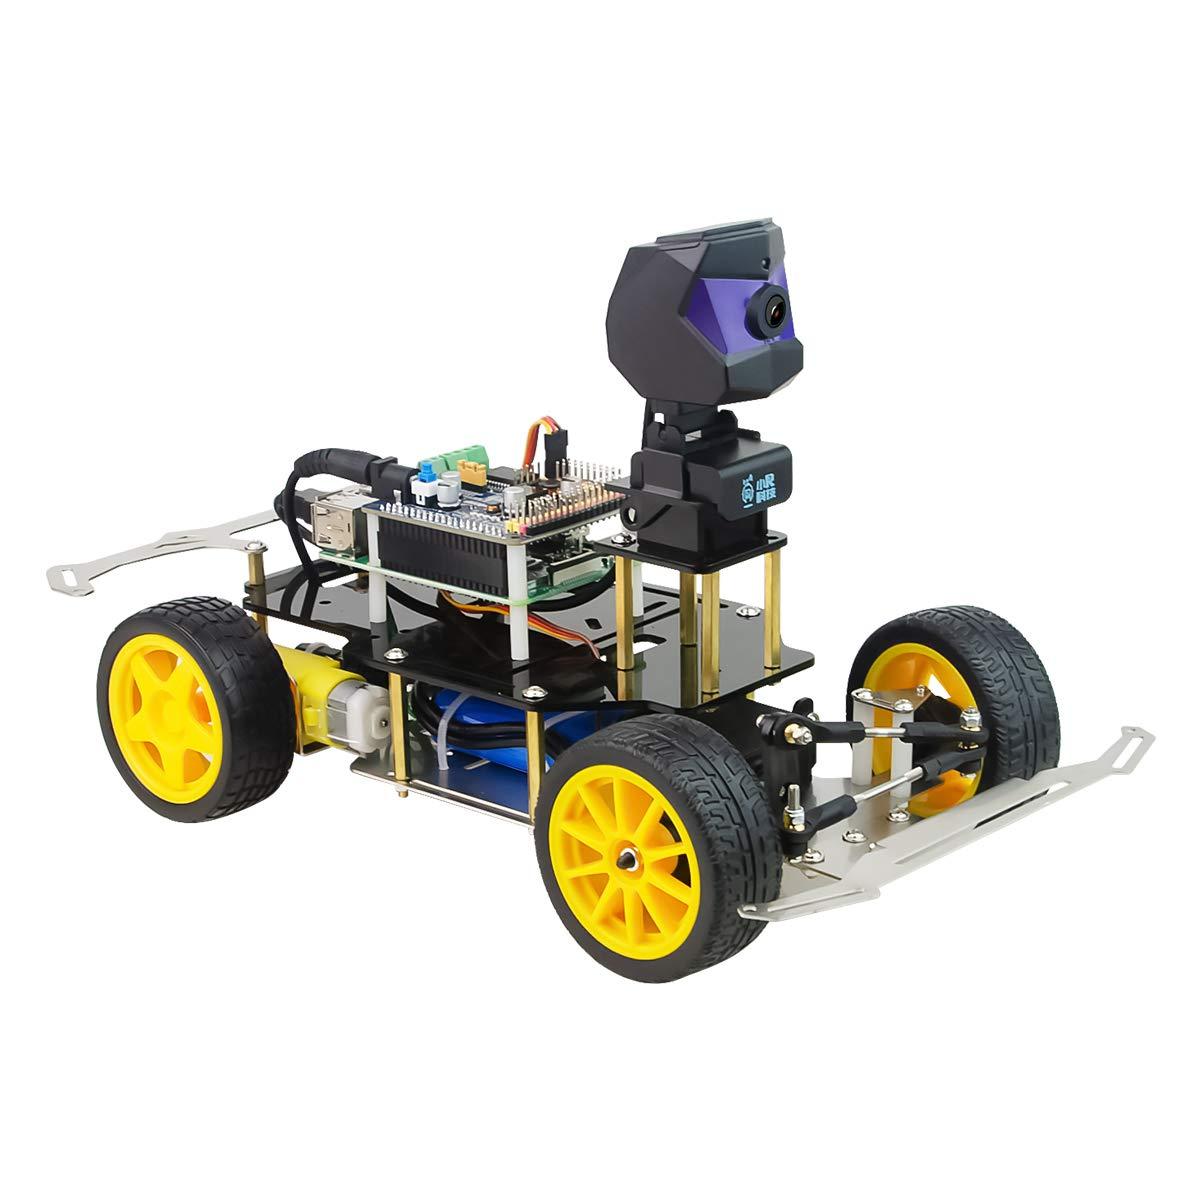 XiaoR Geek Donkey Car Starter Kit Opensource DIY Self Driving Platform for Small Scale Cars Raspberry Pi Robot Car